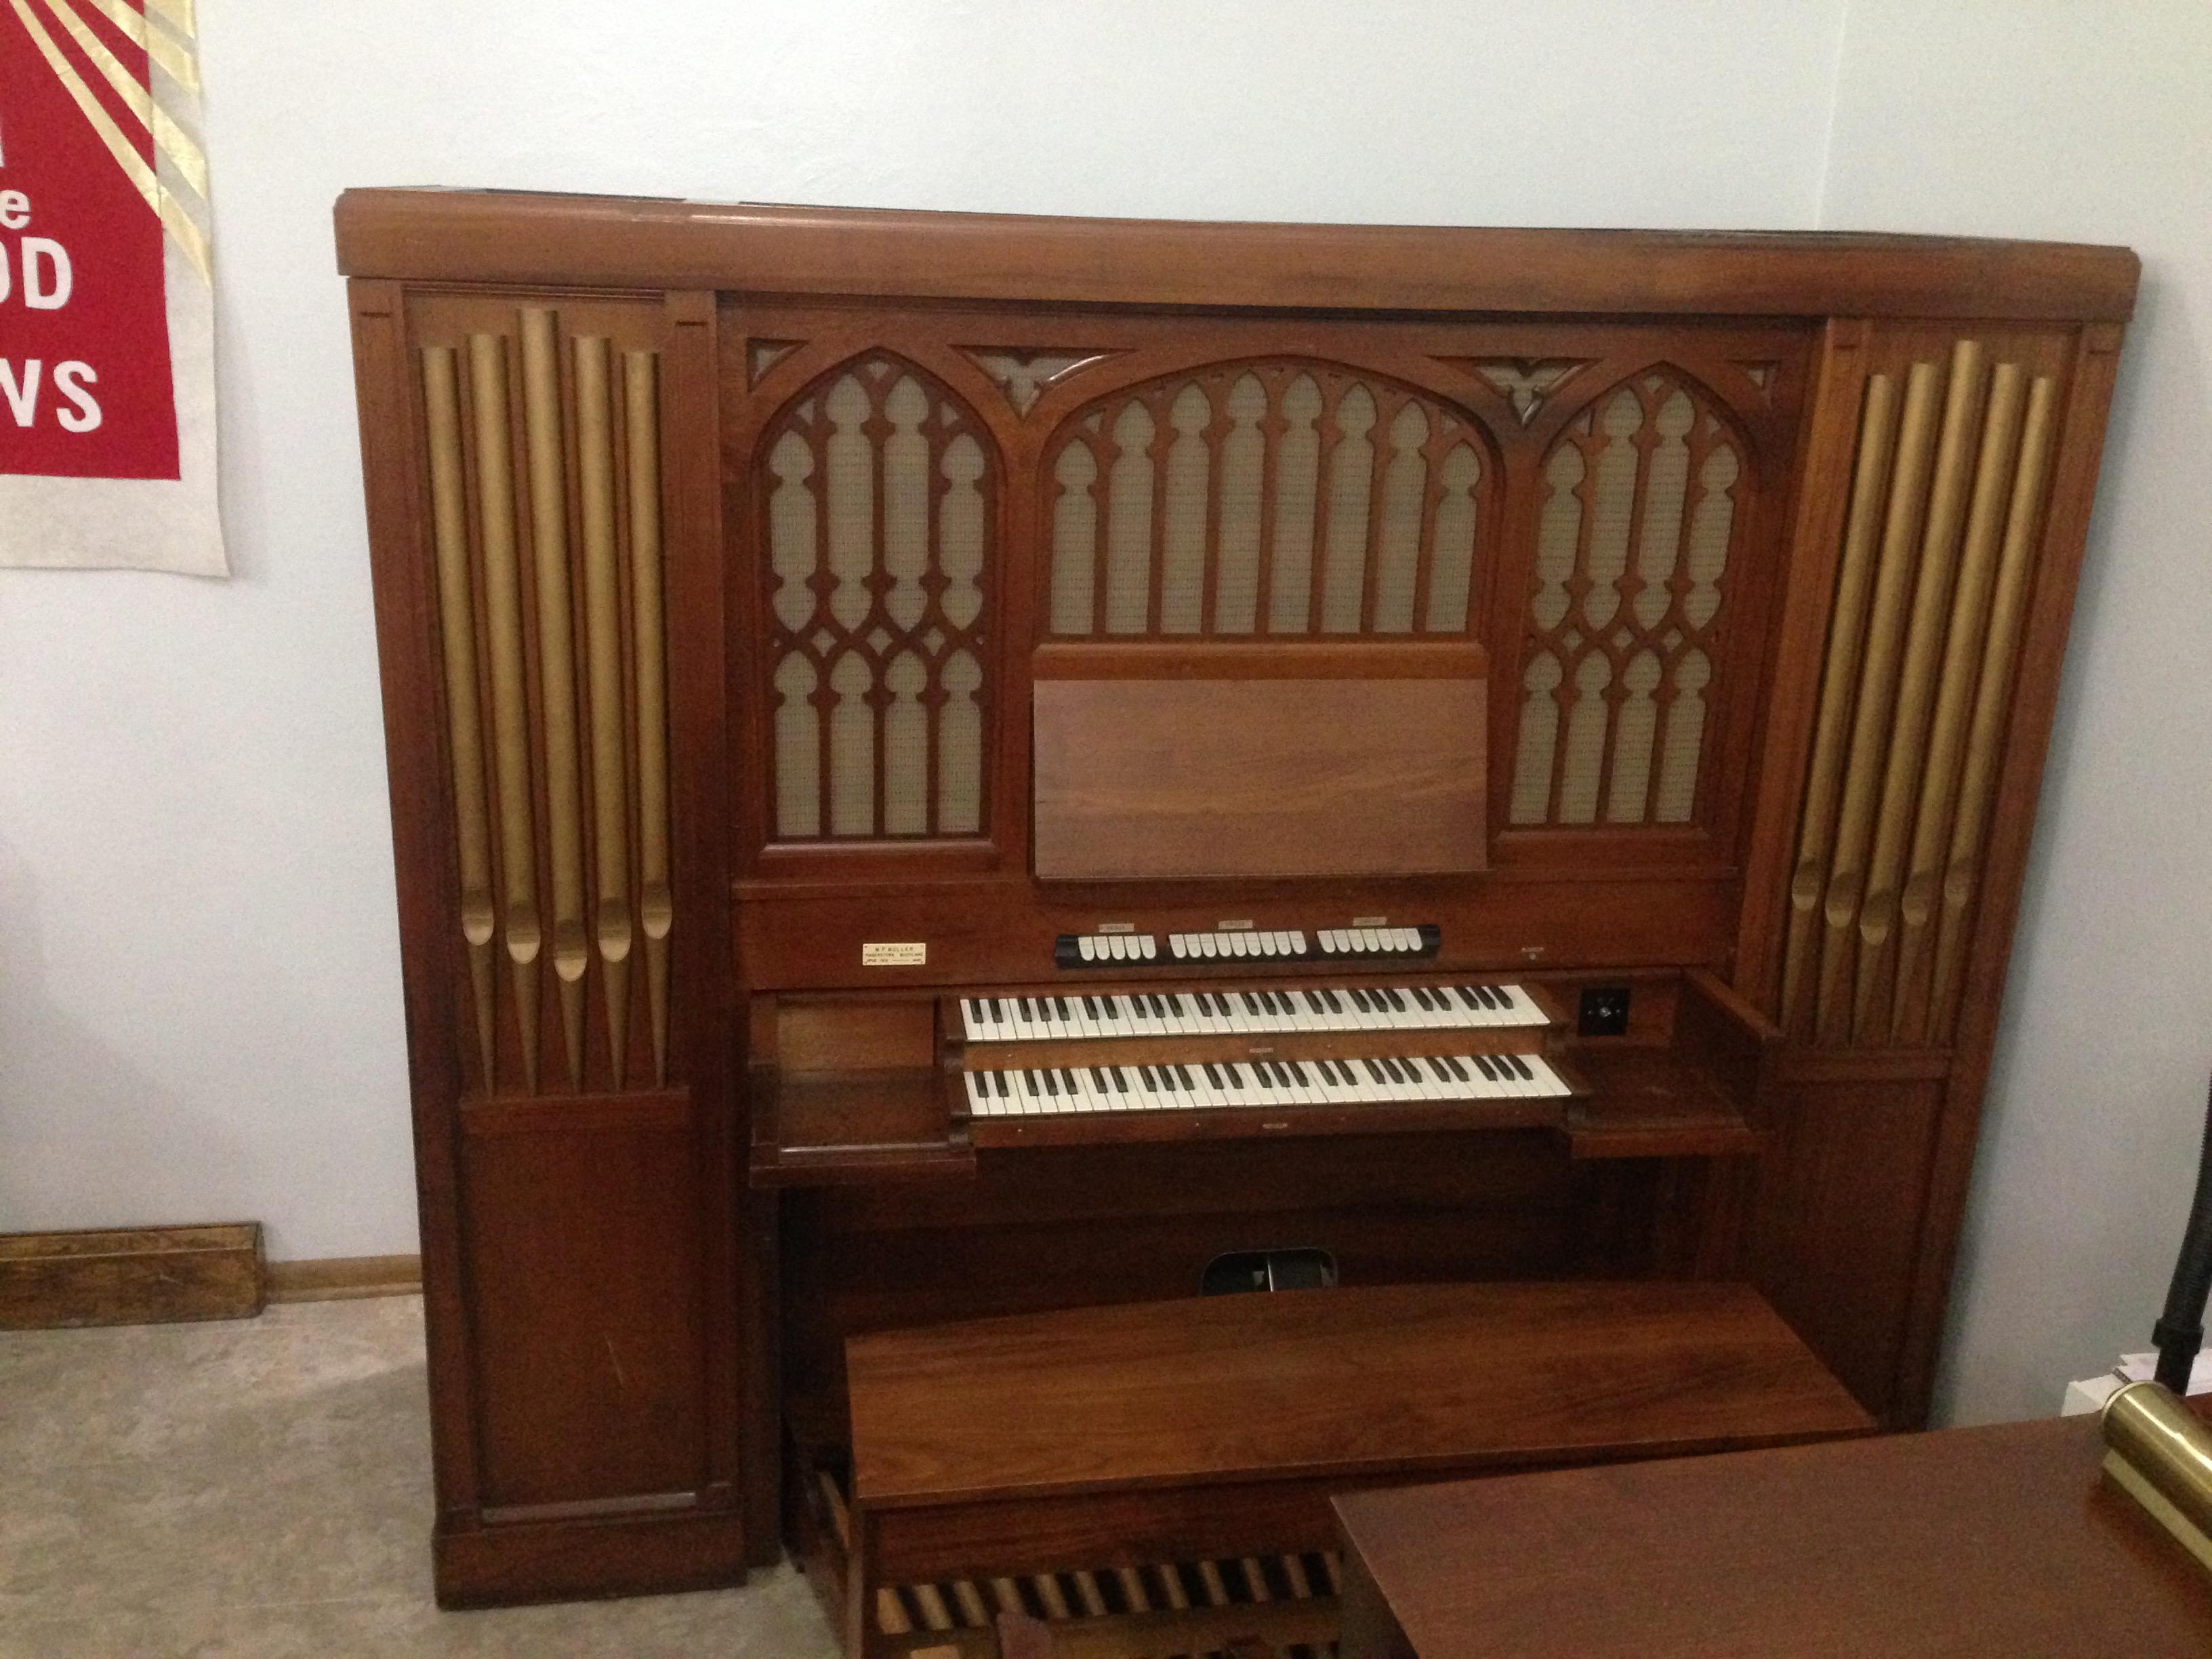 1932 Möller Artiste Opus 6474 FOR SALE - Buzard Organs